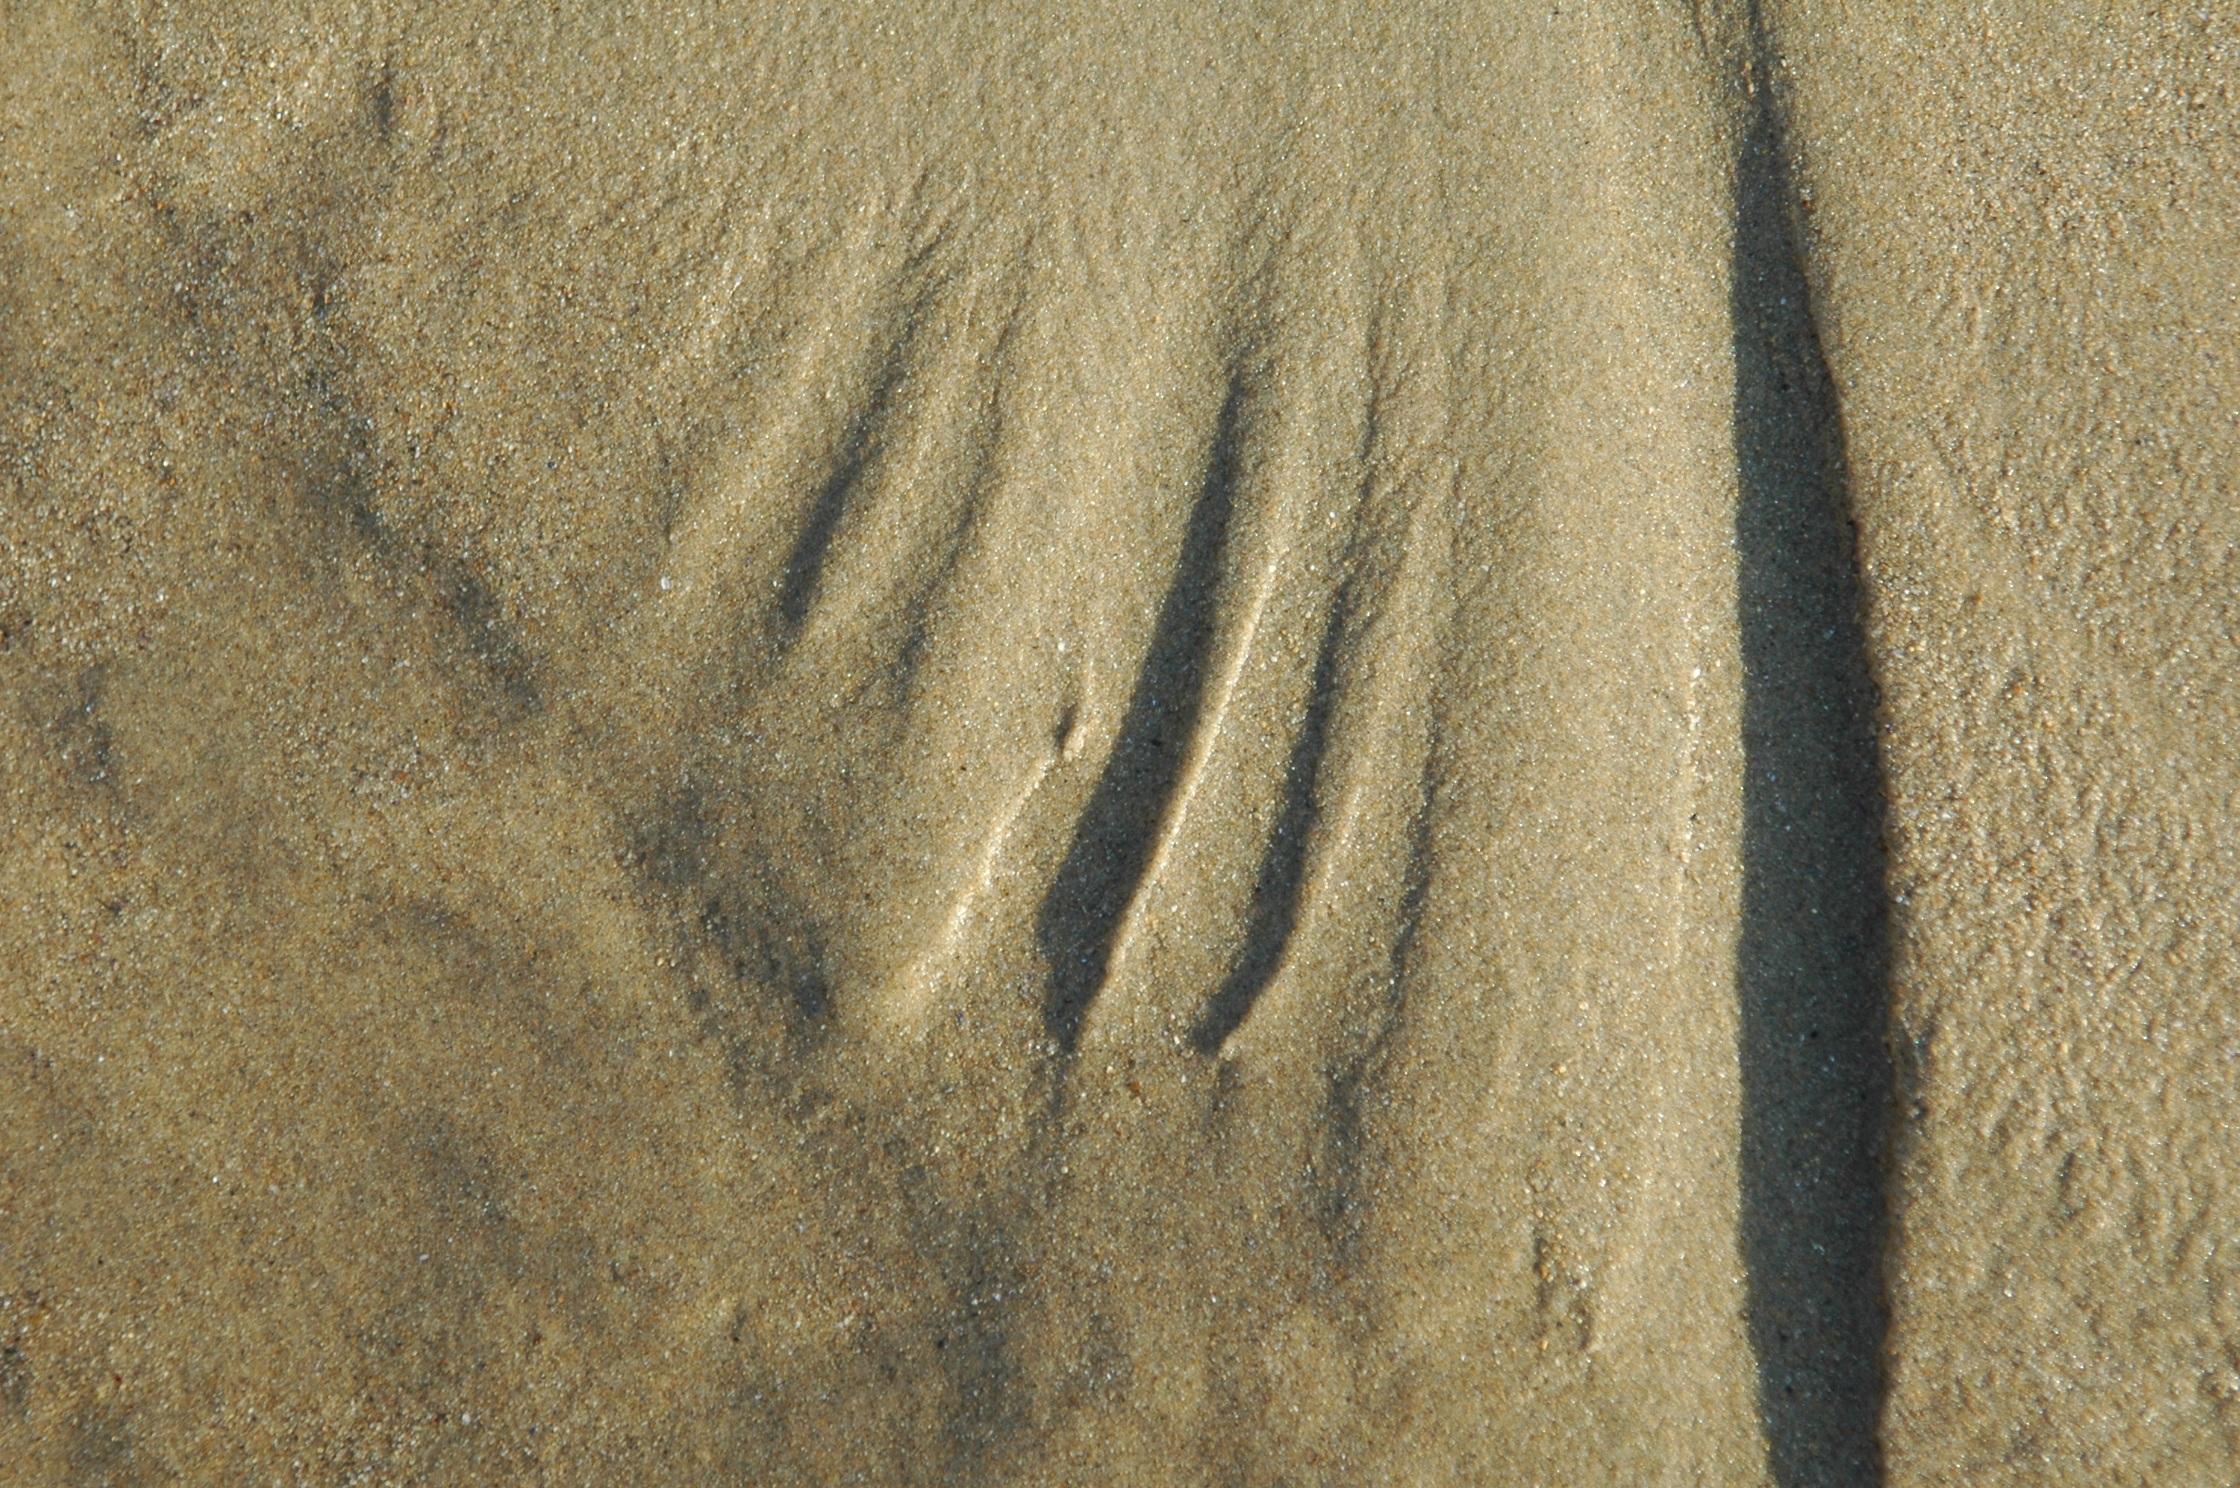 Beach Nature Sand Rock Wood Texture Floor Wall Soil Material Design Flooring Background